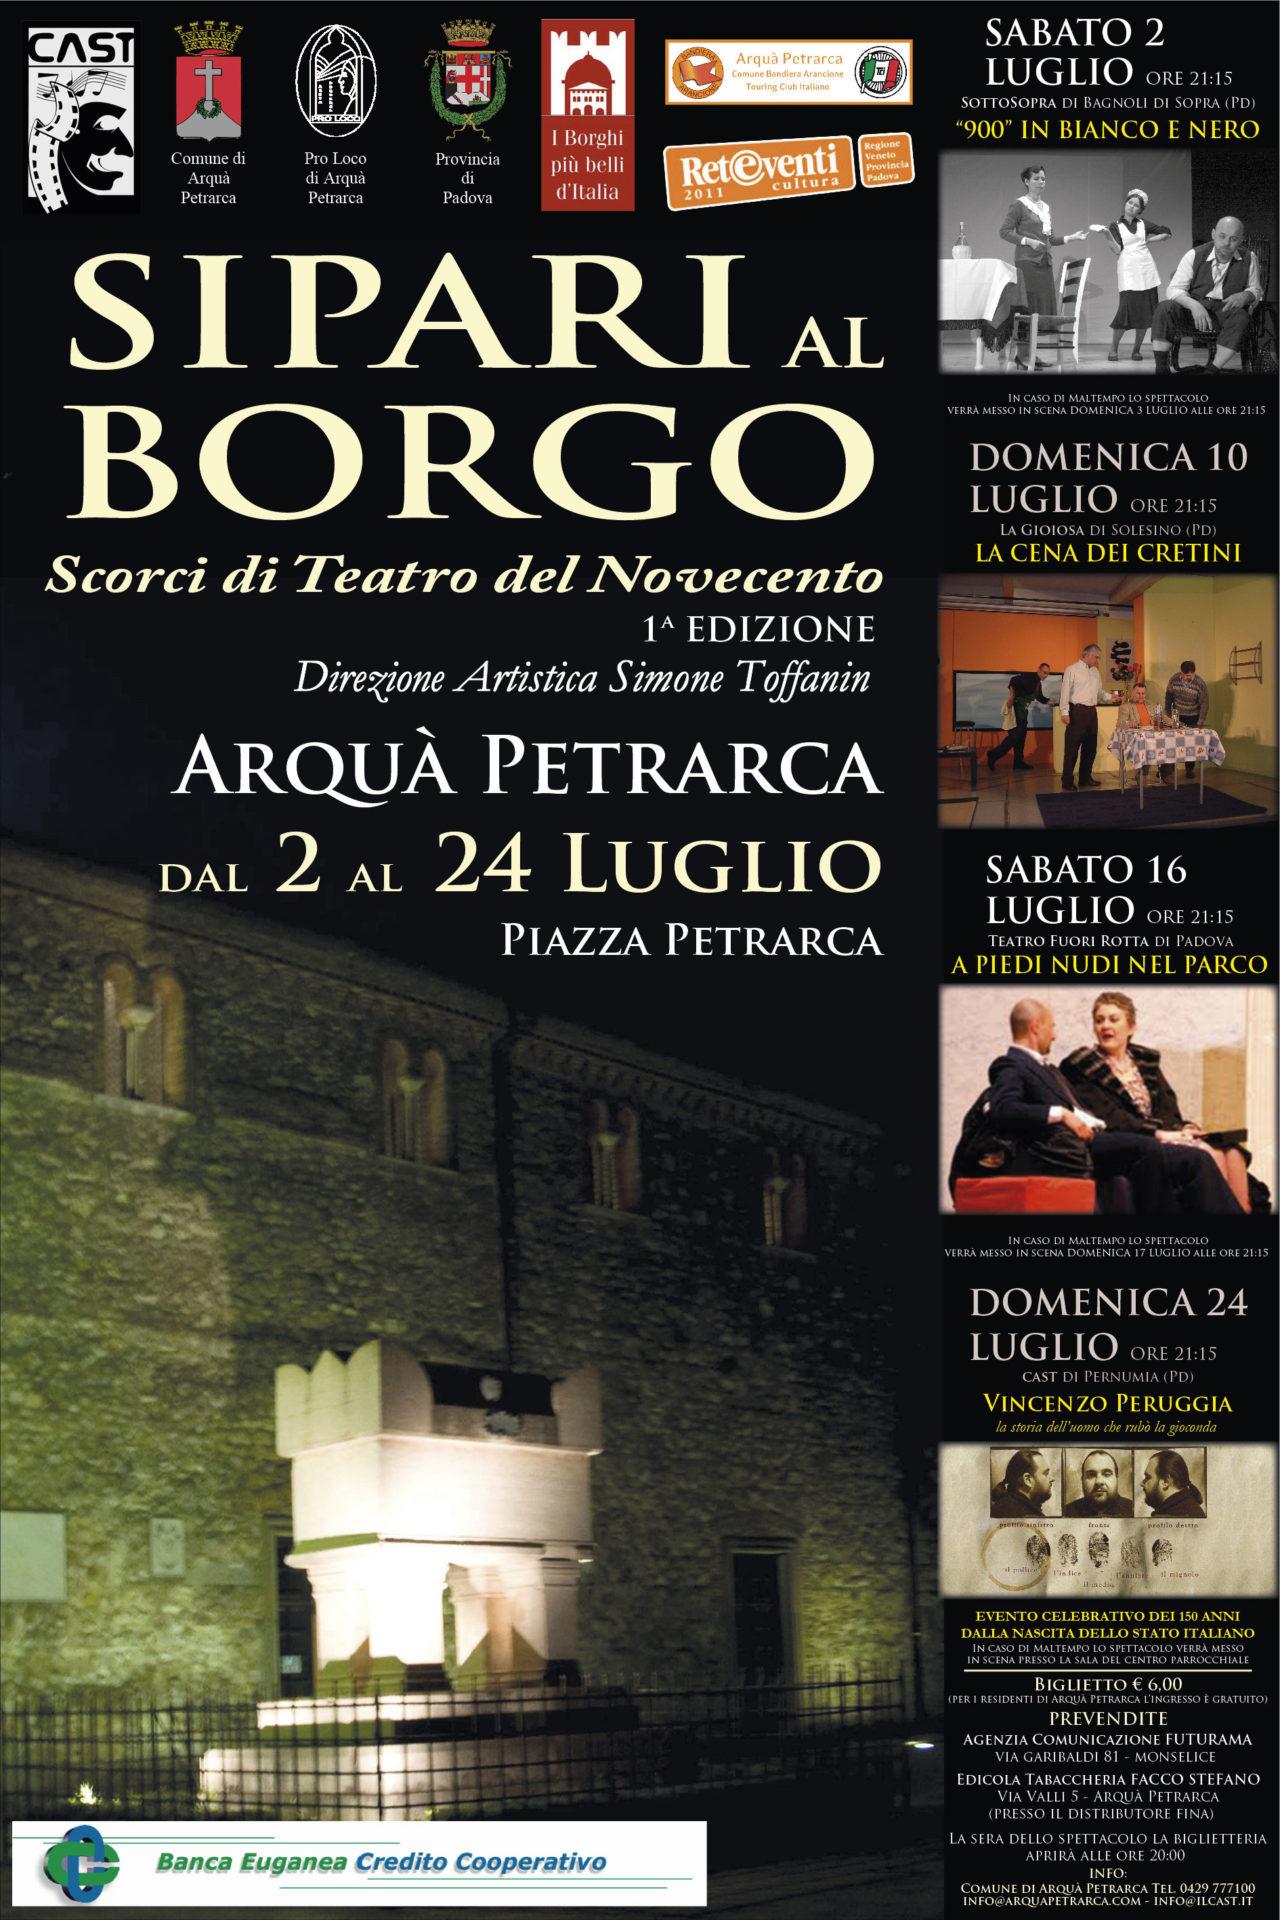 Sipari al Borgo 2011